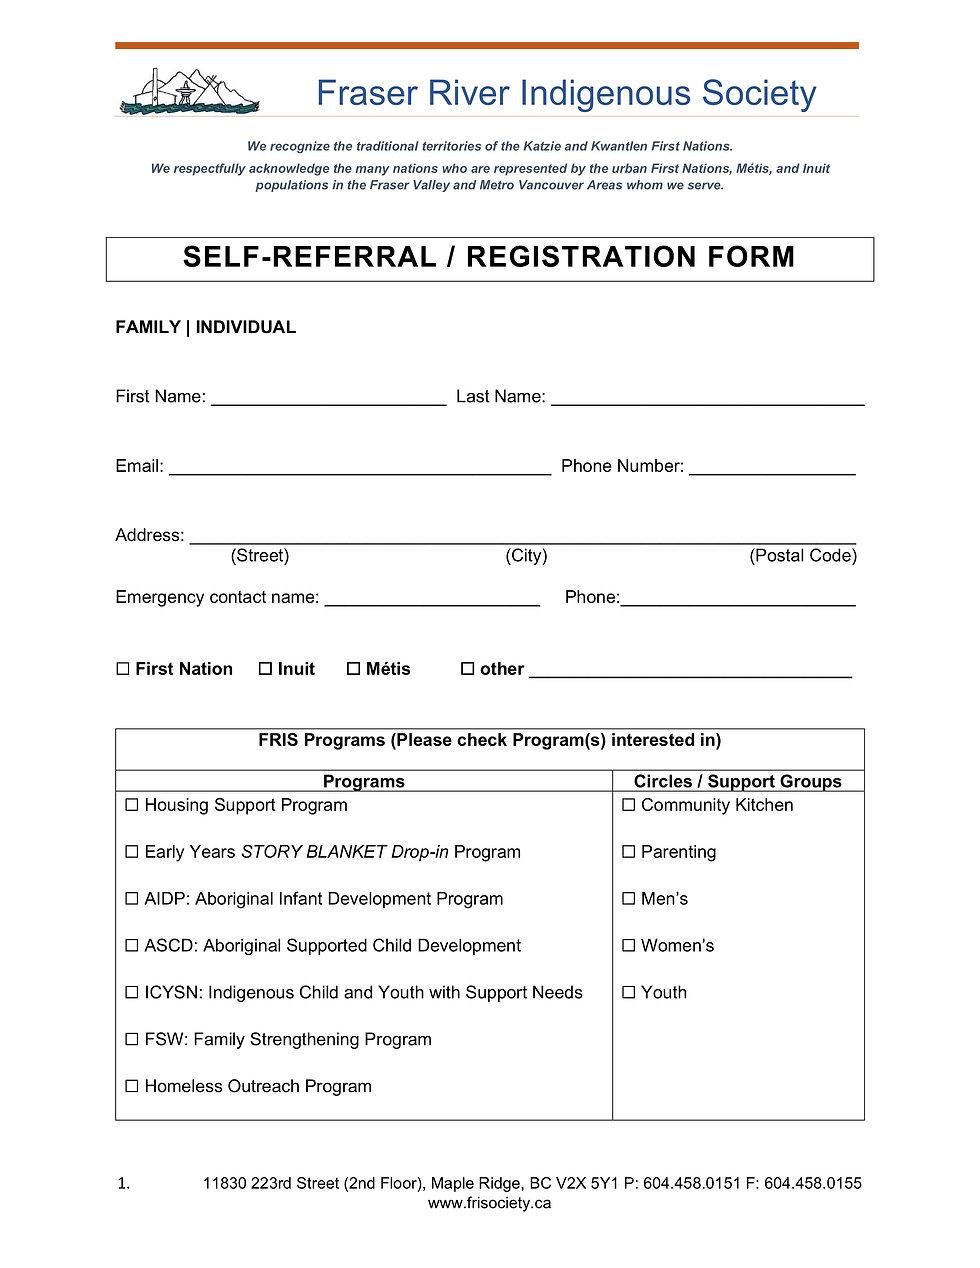 FRIS Self Refferal - Registration Form A